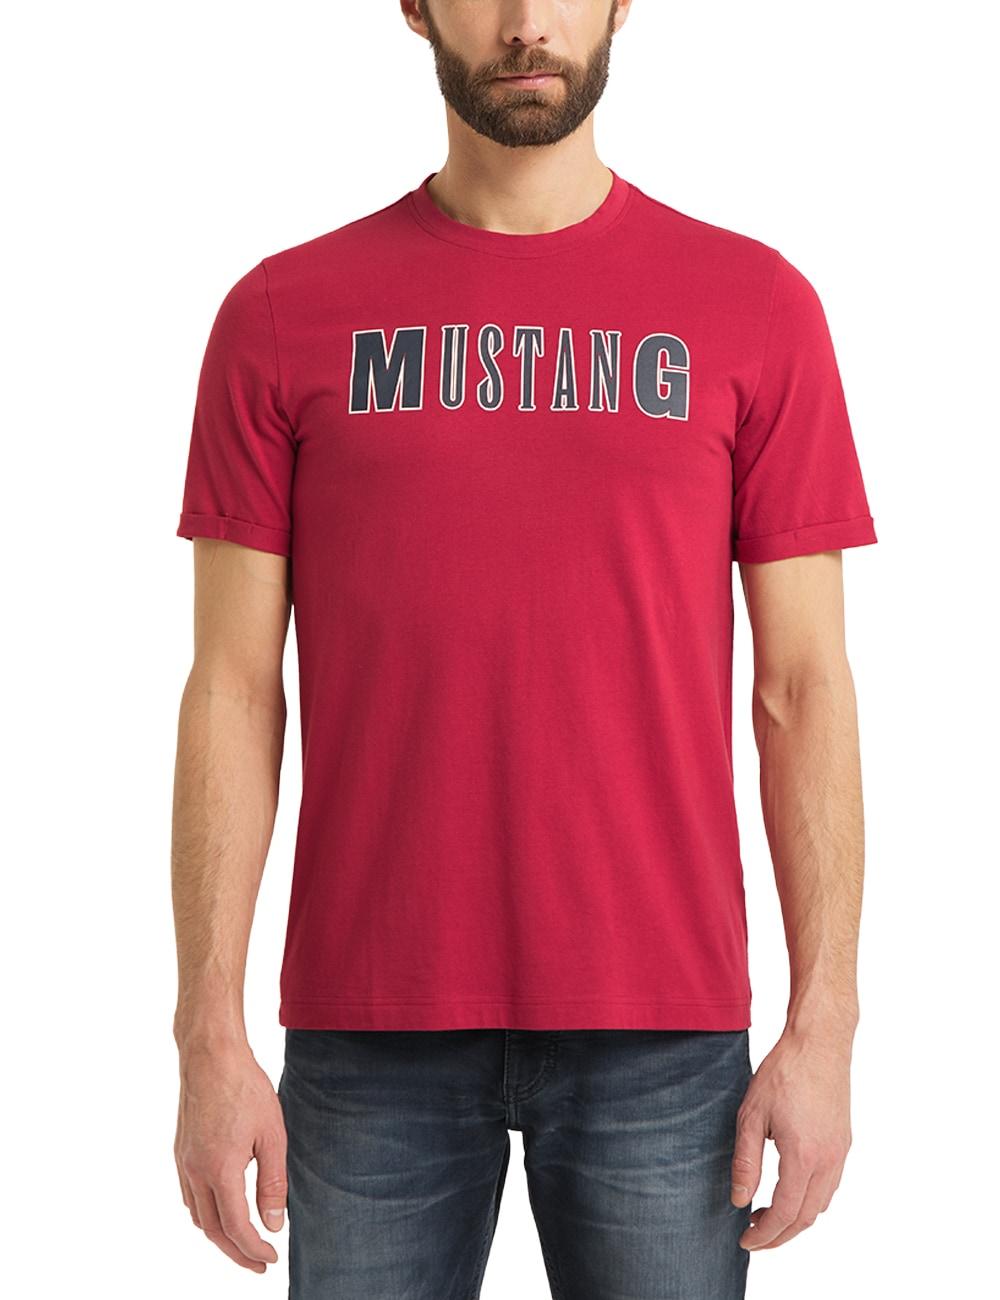 MUSTANG T-Shirt Alex C LOGO Tee, rot Herren Mustang